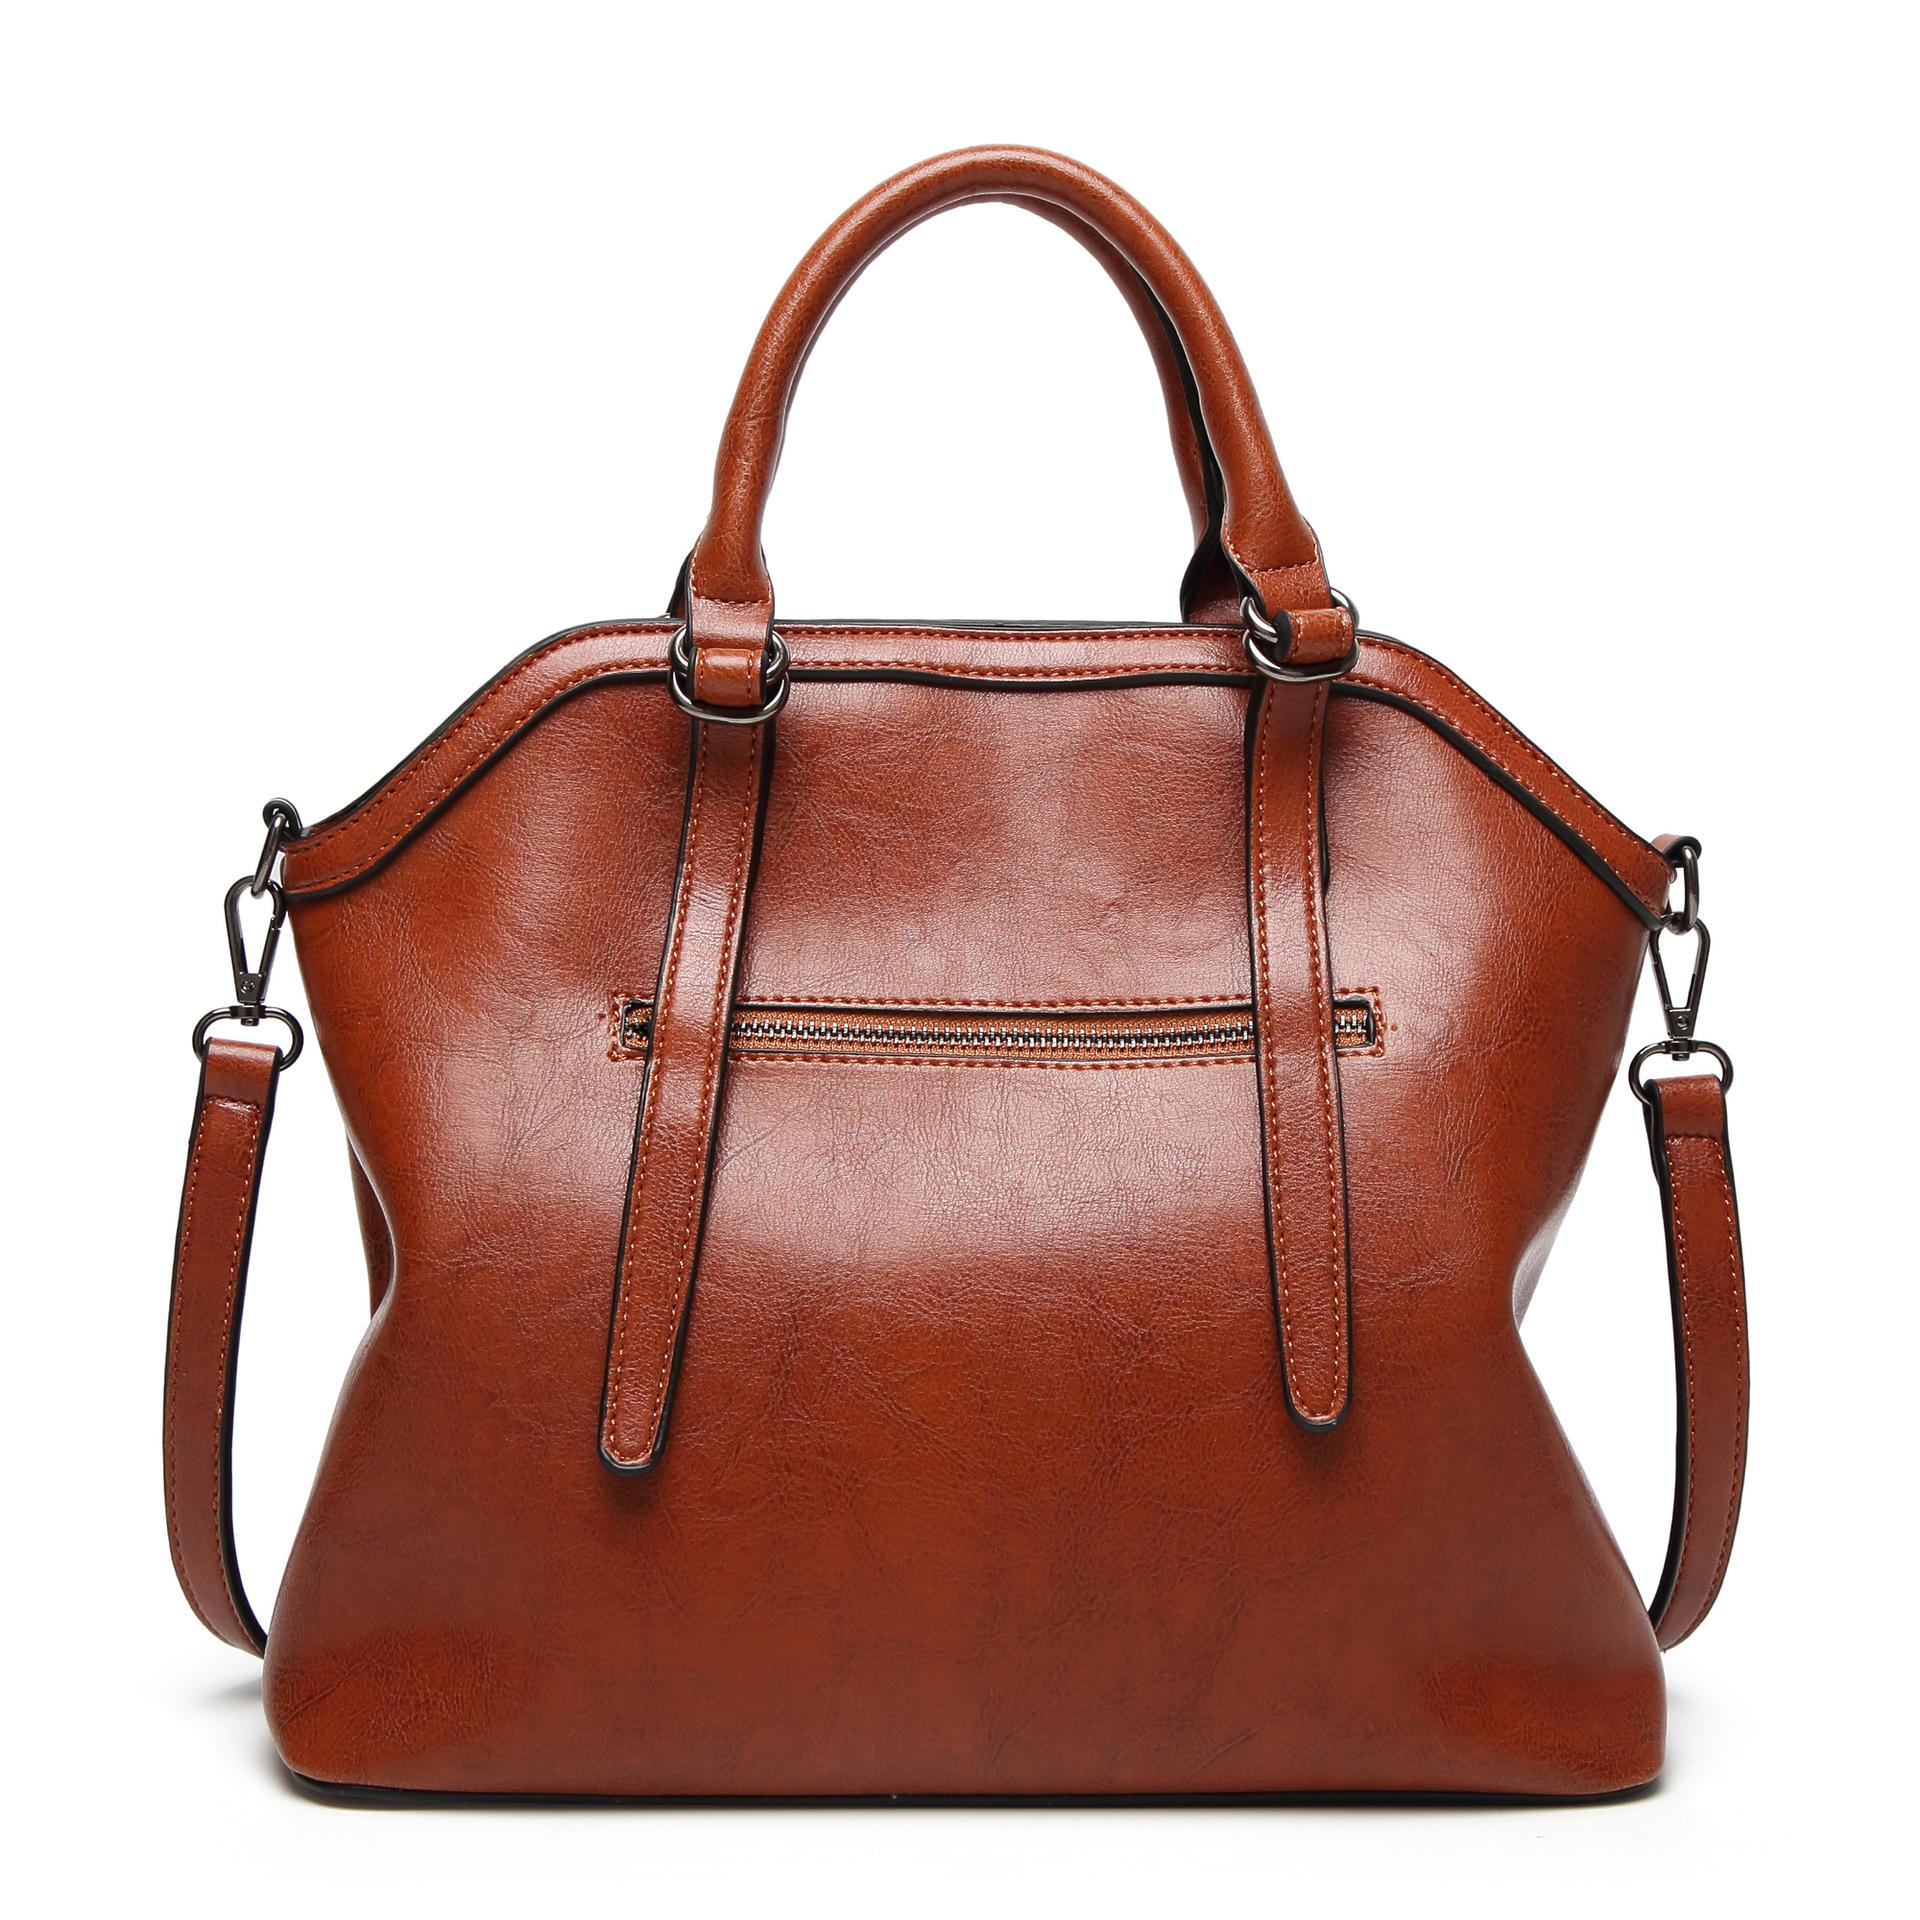 9ef63813b41f 2018 Special Offer Totes New Women Handbags Brown Burgundy Shoulder ...